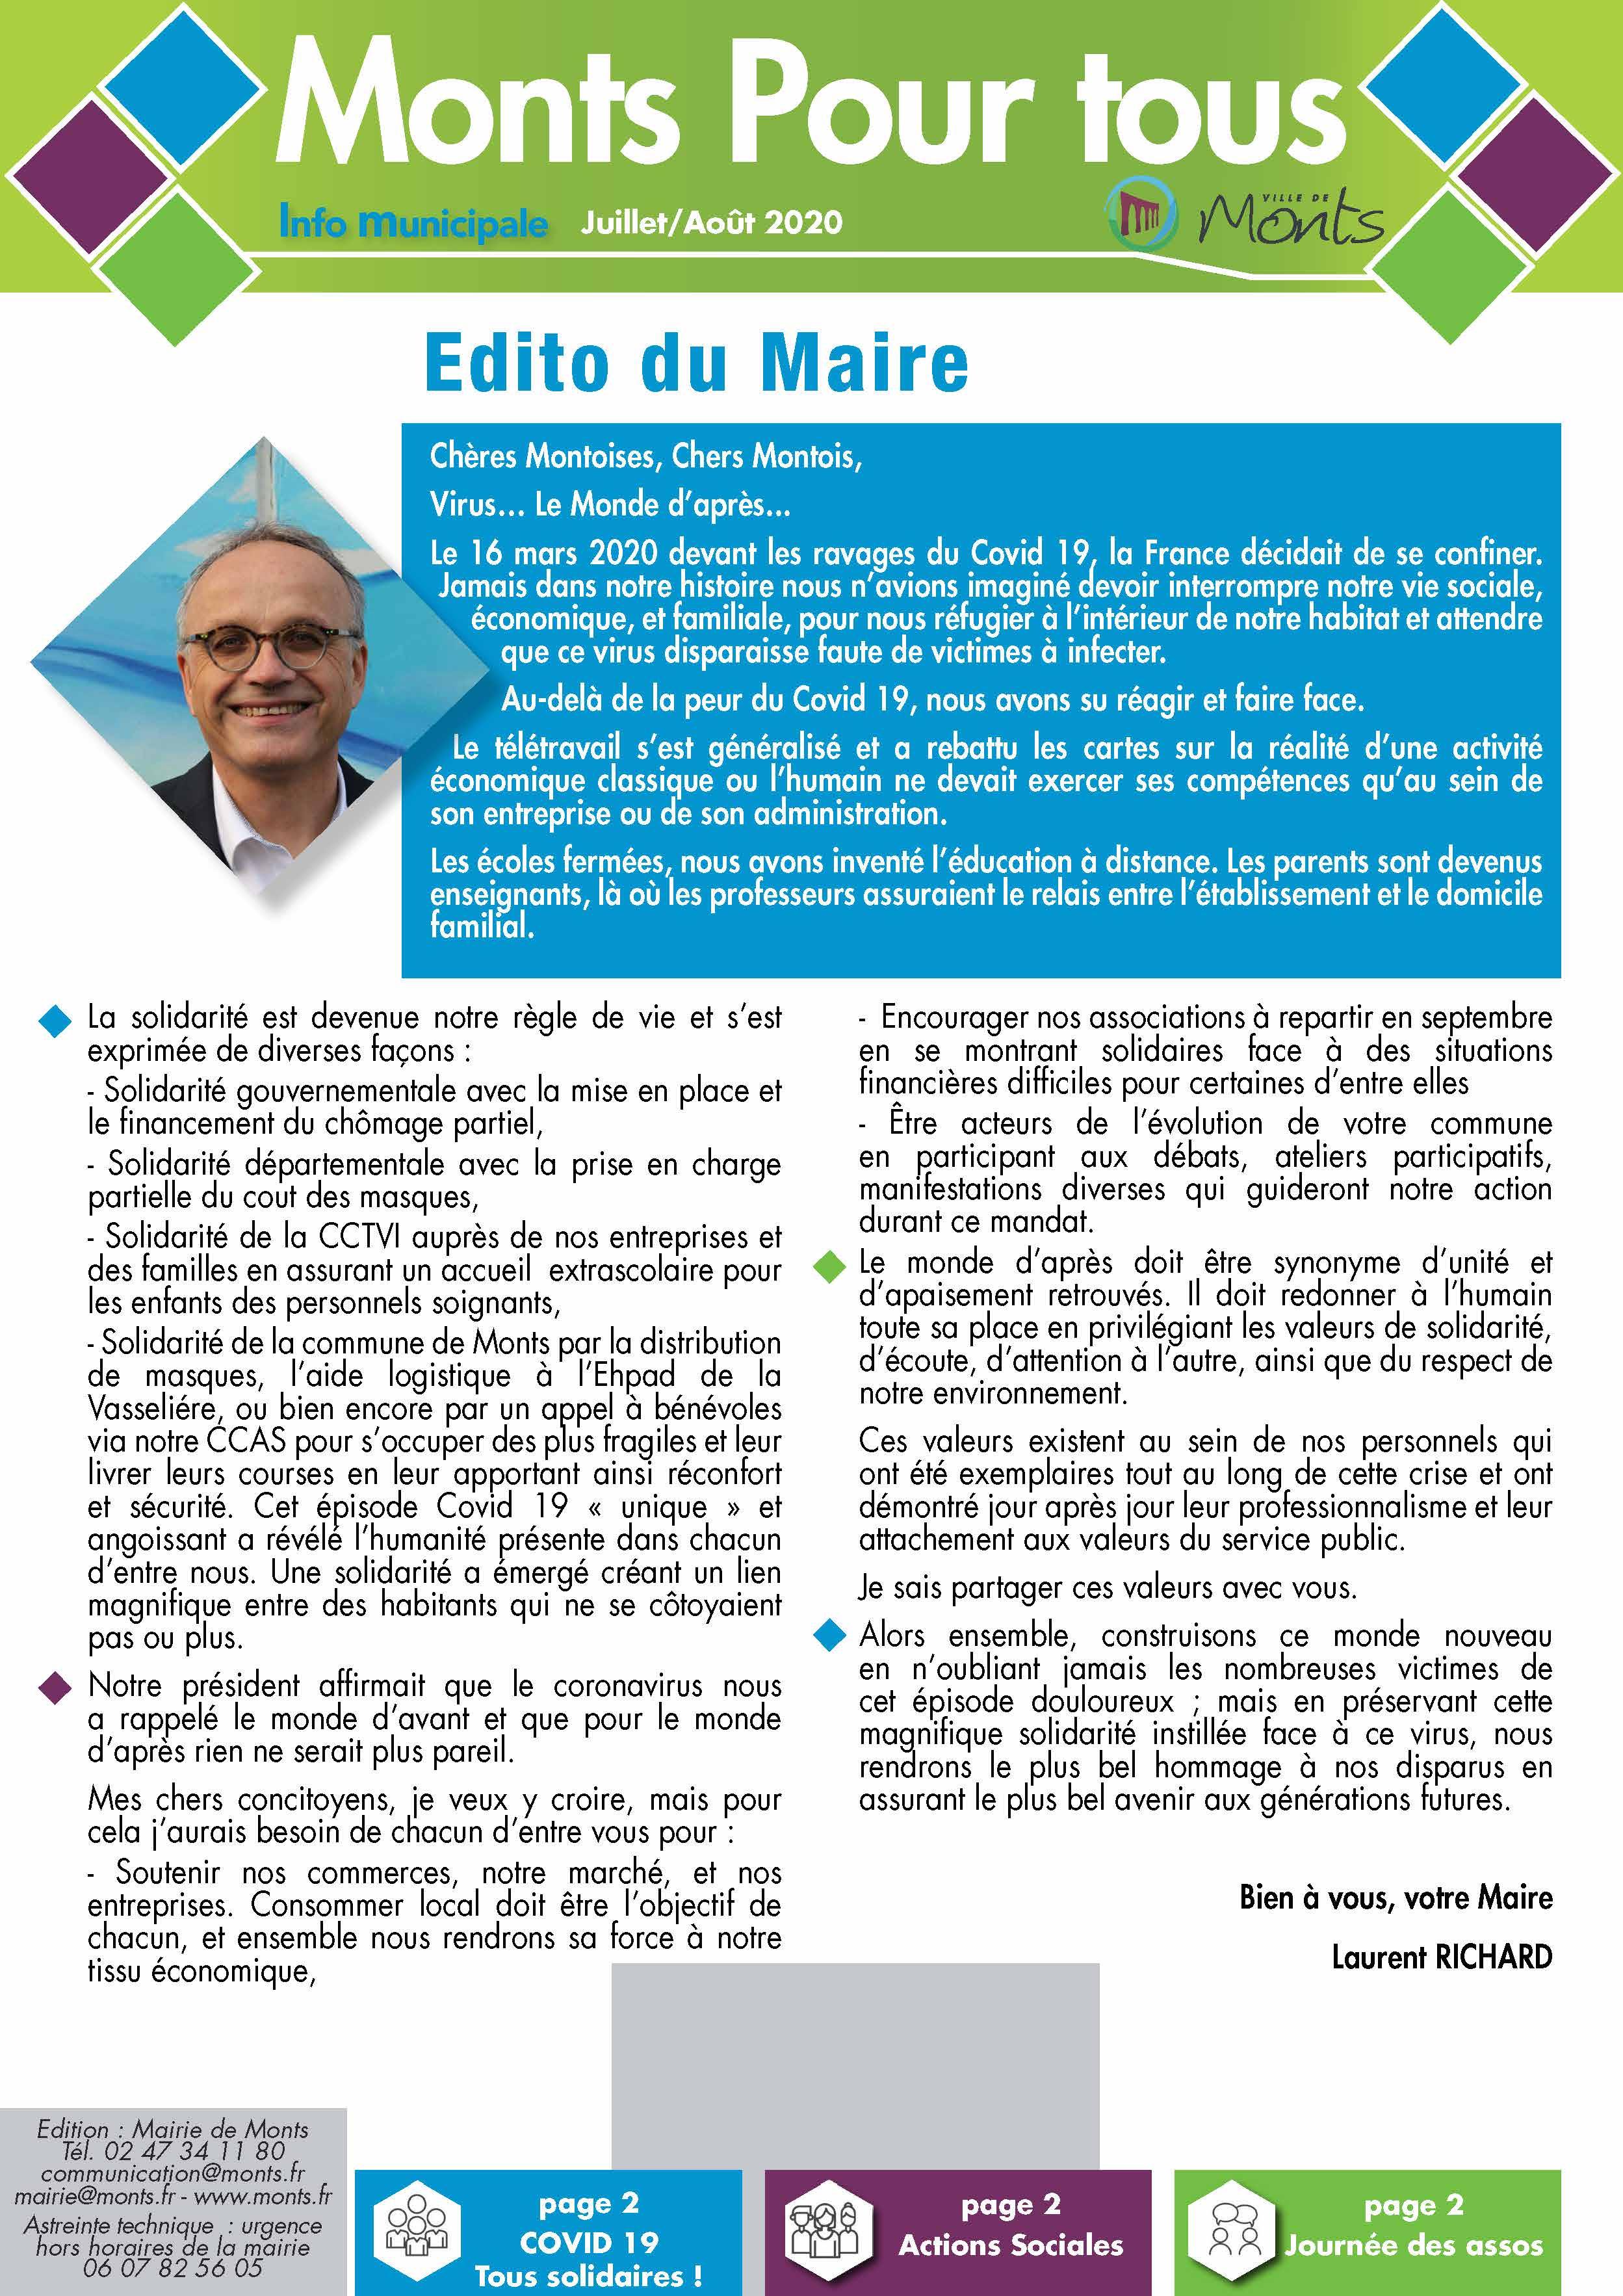 INFO MUNICIPALE JUILLET AOUT 2020_Page_1.jpg